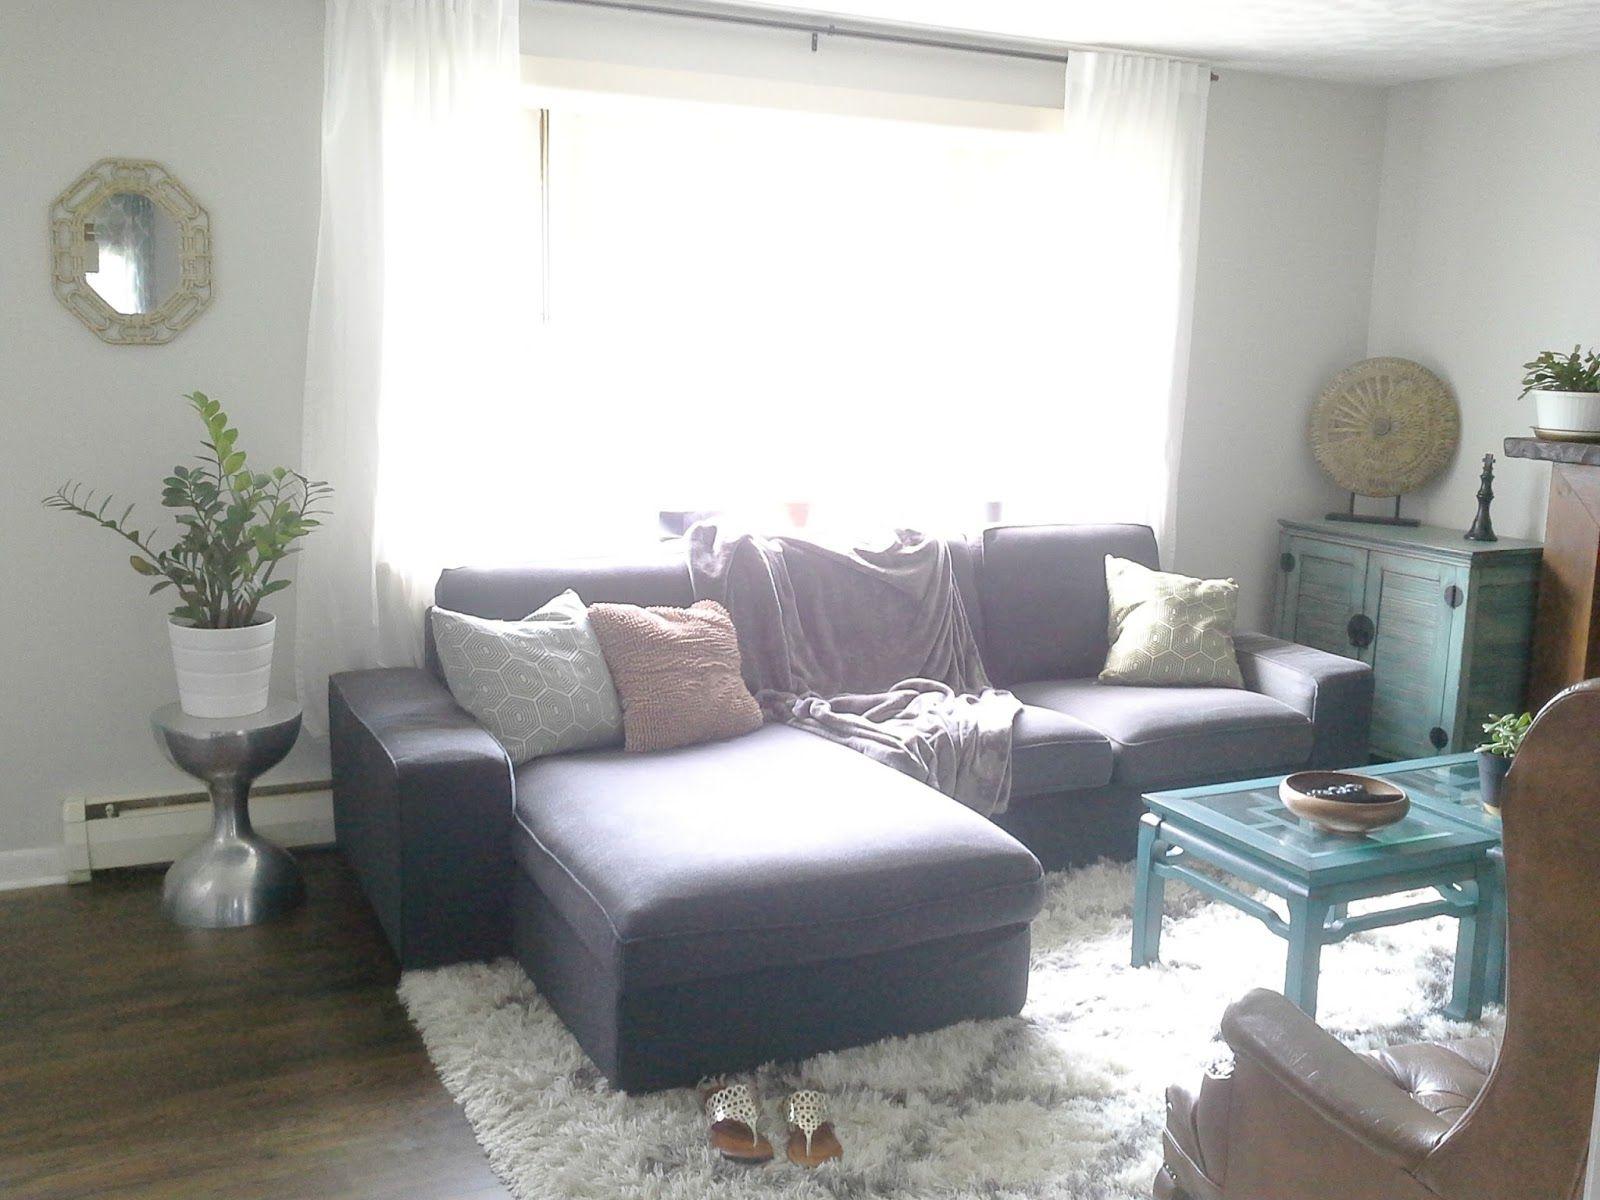 Ikea Kivik Review Kivik sofa, Home design living room